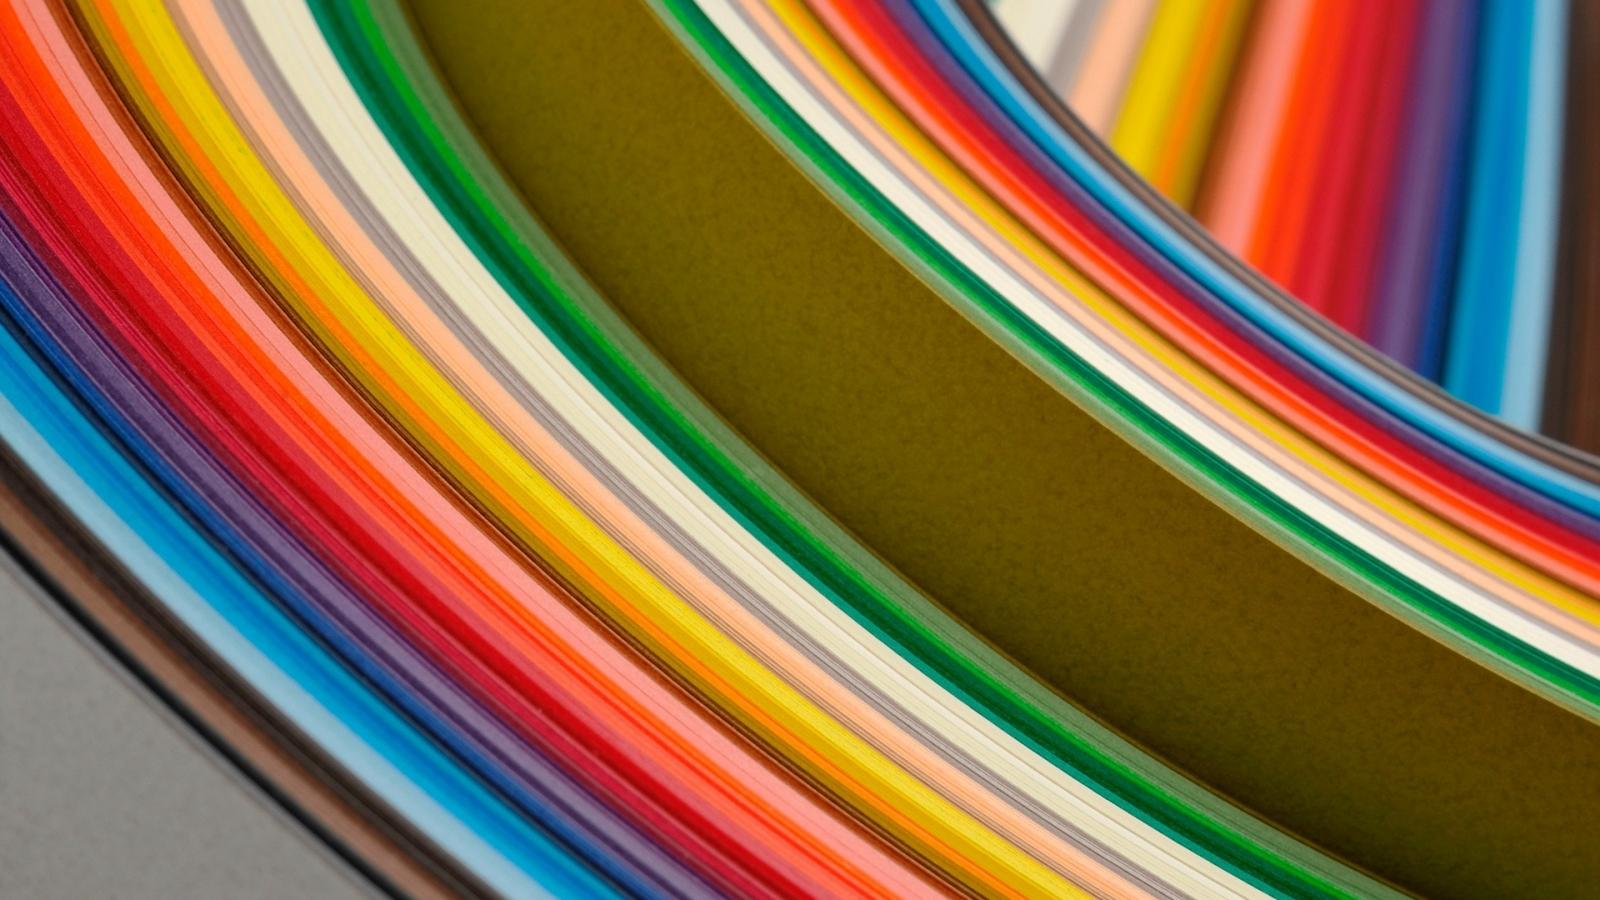 Curvas coloridas Windows 8 - 1600x900